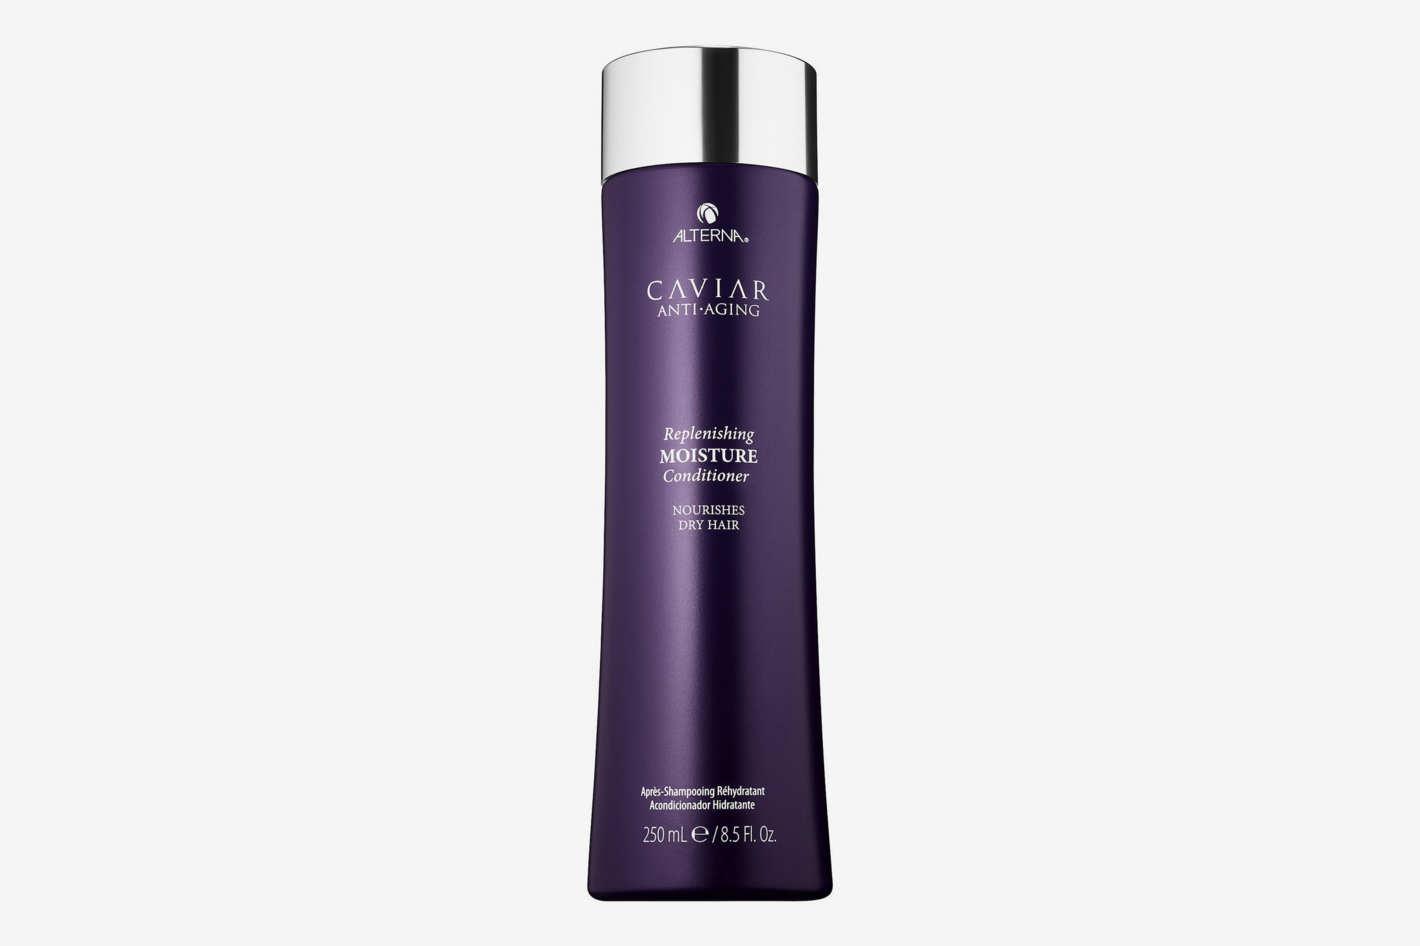 Alterna Haircare Caviar Anti-Aging Replenishing Moisture Conditioner